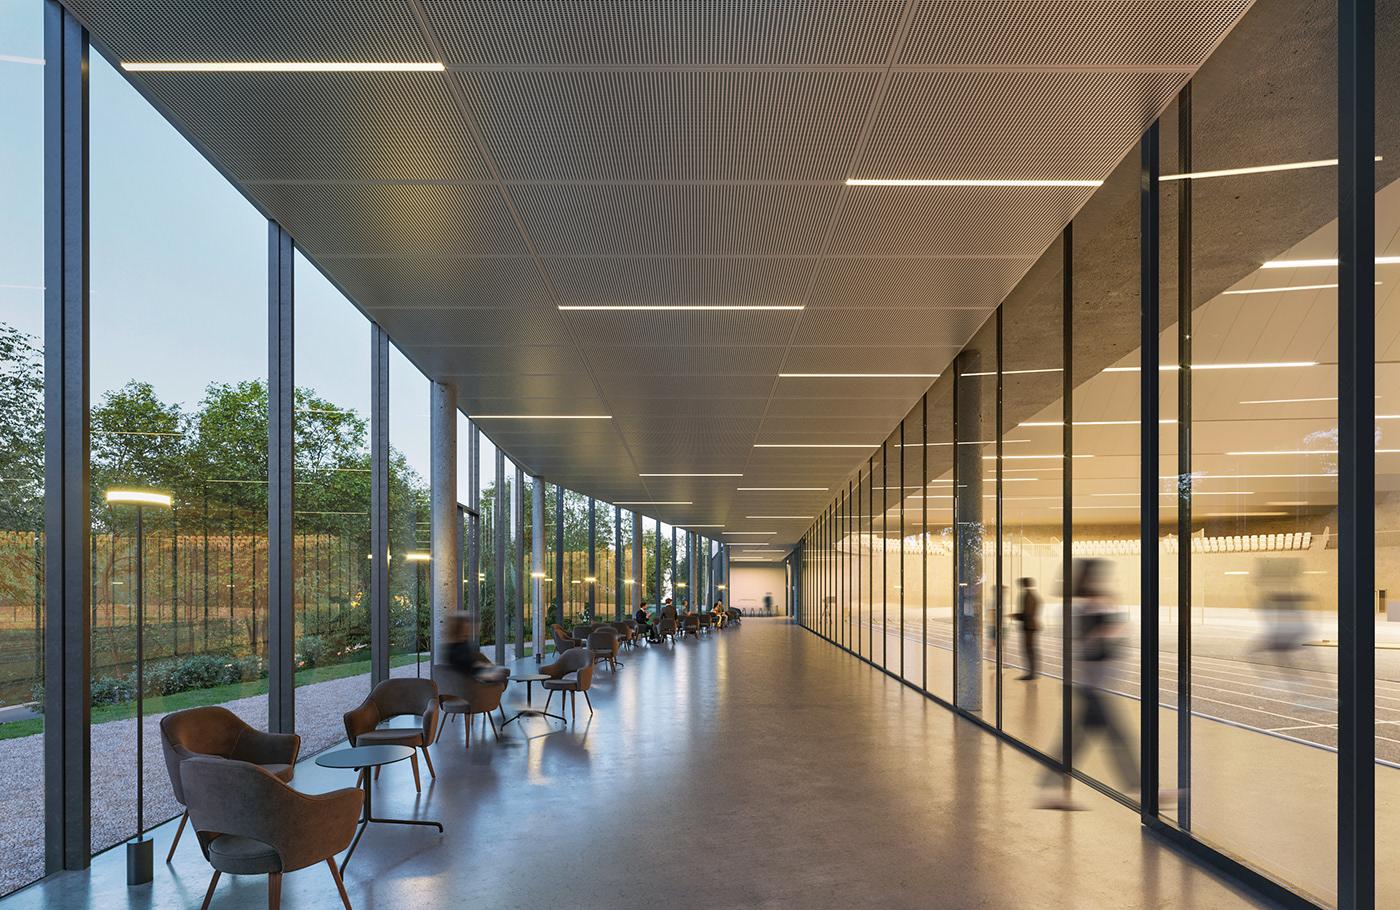 architecture Arena athletics CGI Competition Interior modern Render Sport Center visualisation